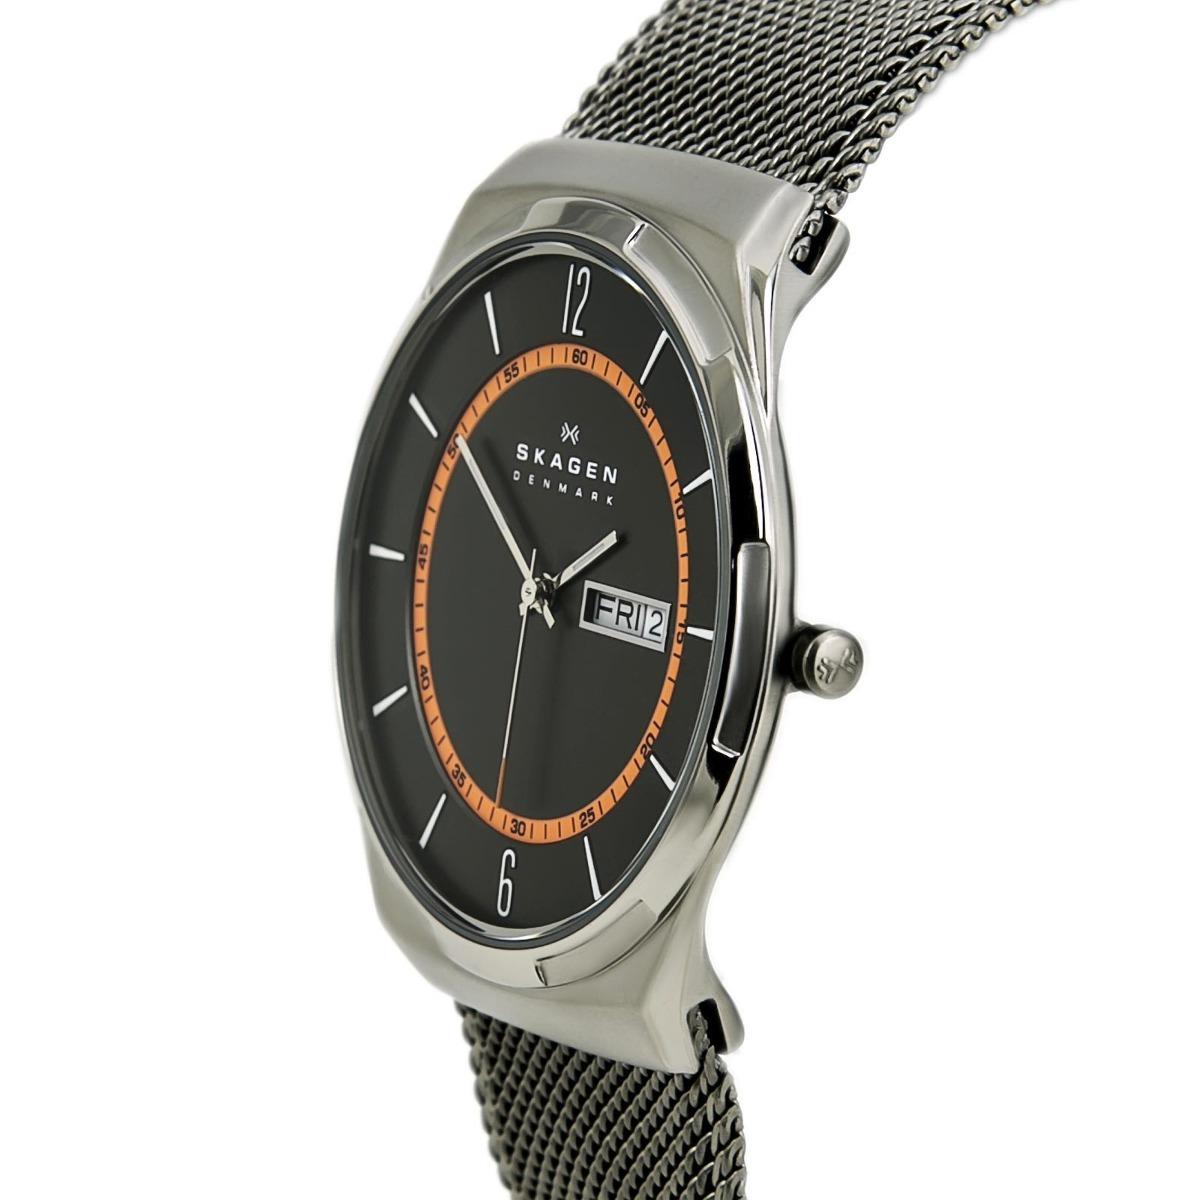 d8daa9026fec9 Relógio Skagen Titanium Slim Skw6007 - R  999,00 em Mercado Livre